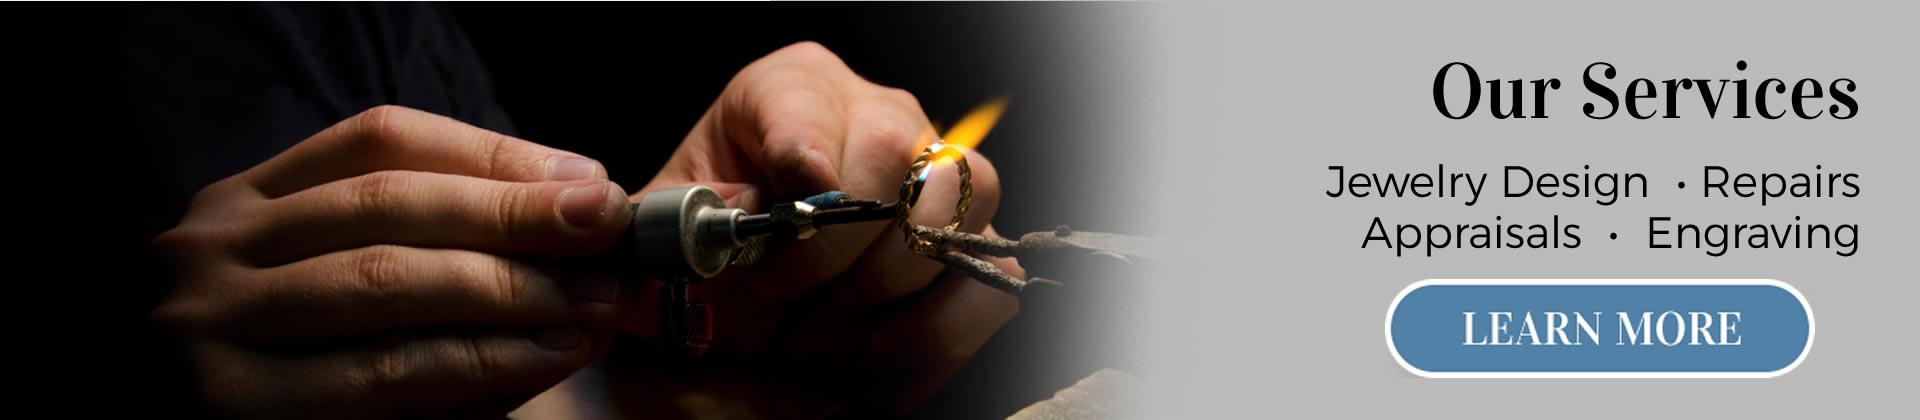 MJ Harrington Jewelers Our Services